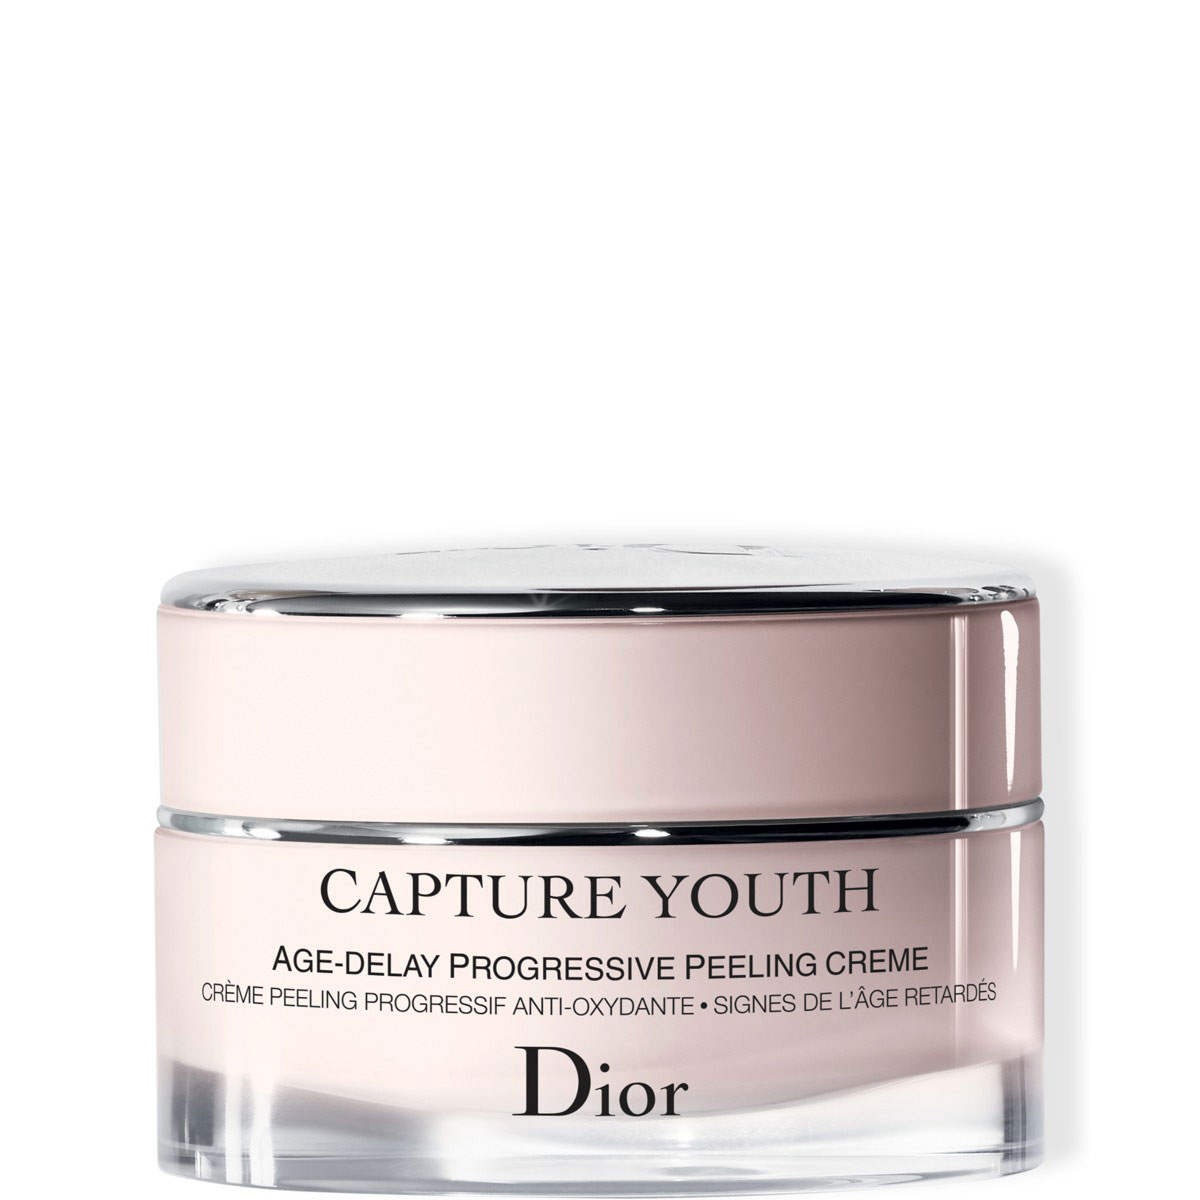 Capture Youth Crème peeling progressif anti-oxydant - DIOR